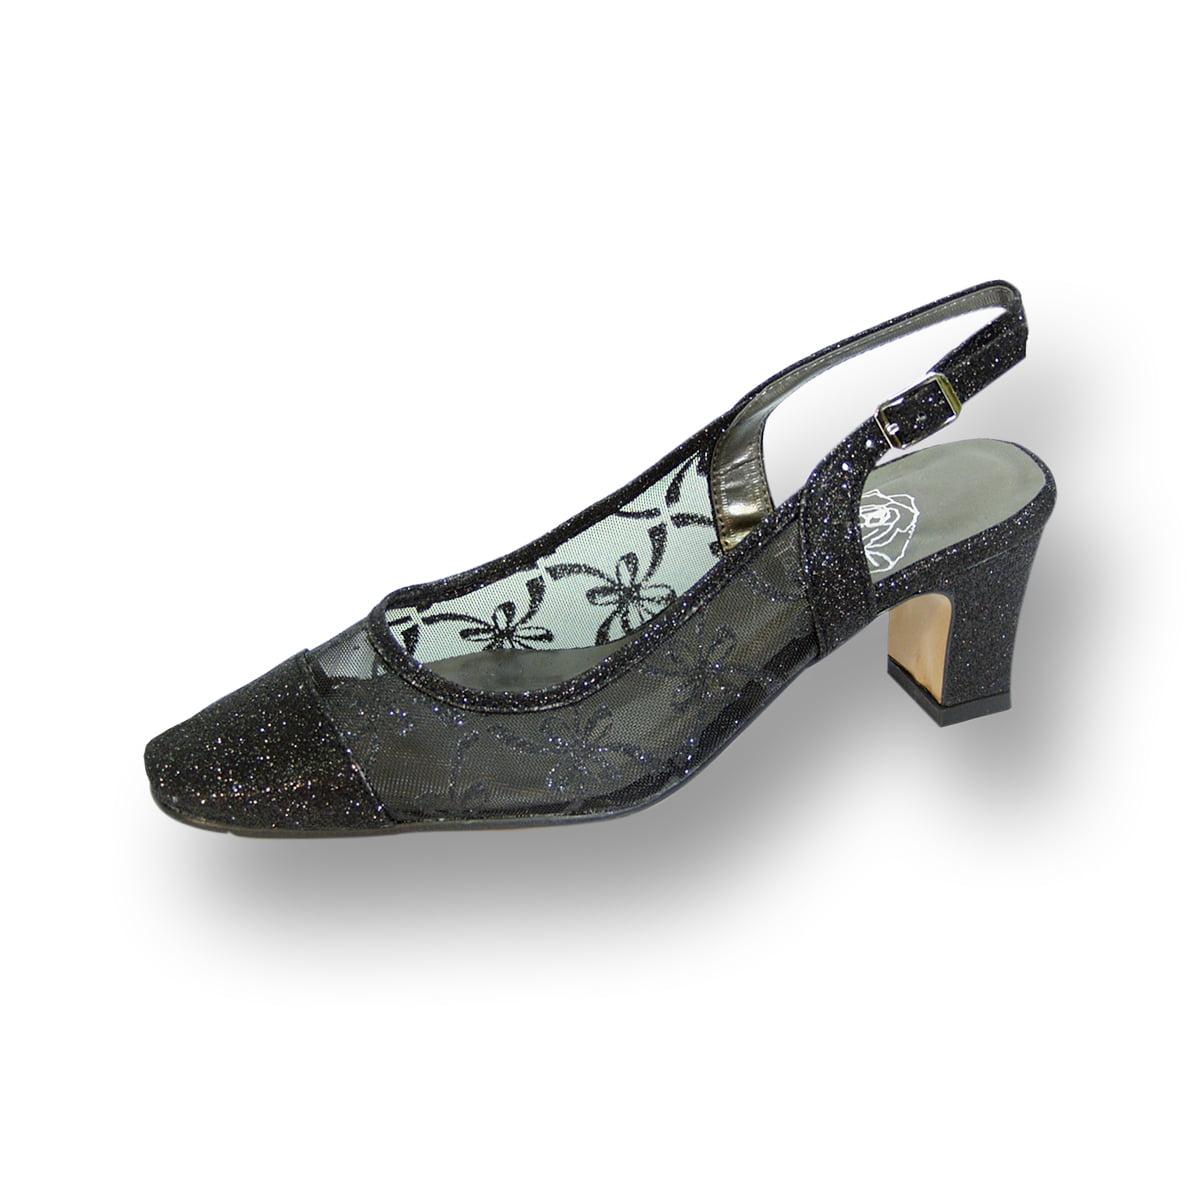 Bridal Shoes Wide Width: FLORAL Jenni Women's Wide Width Evening Dress